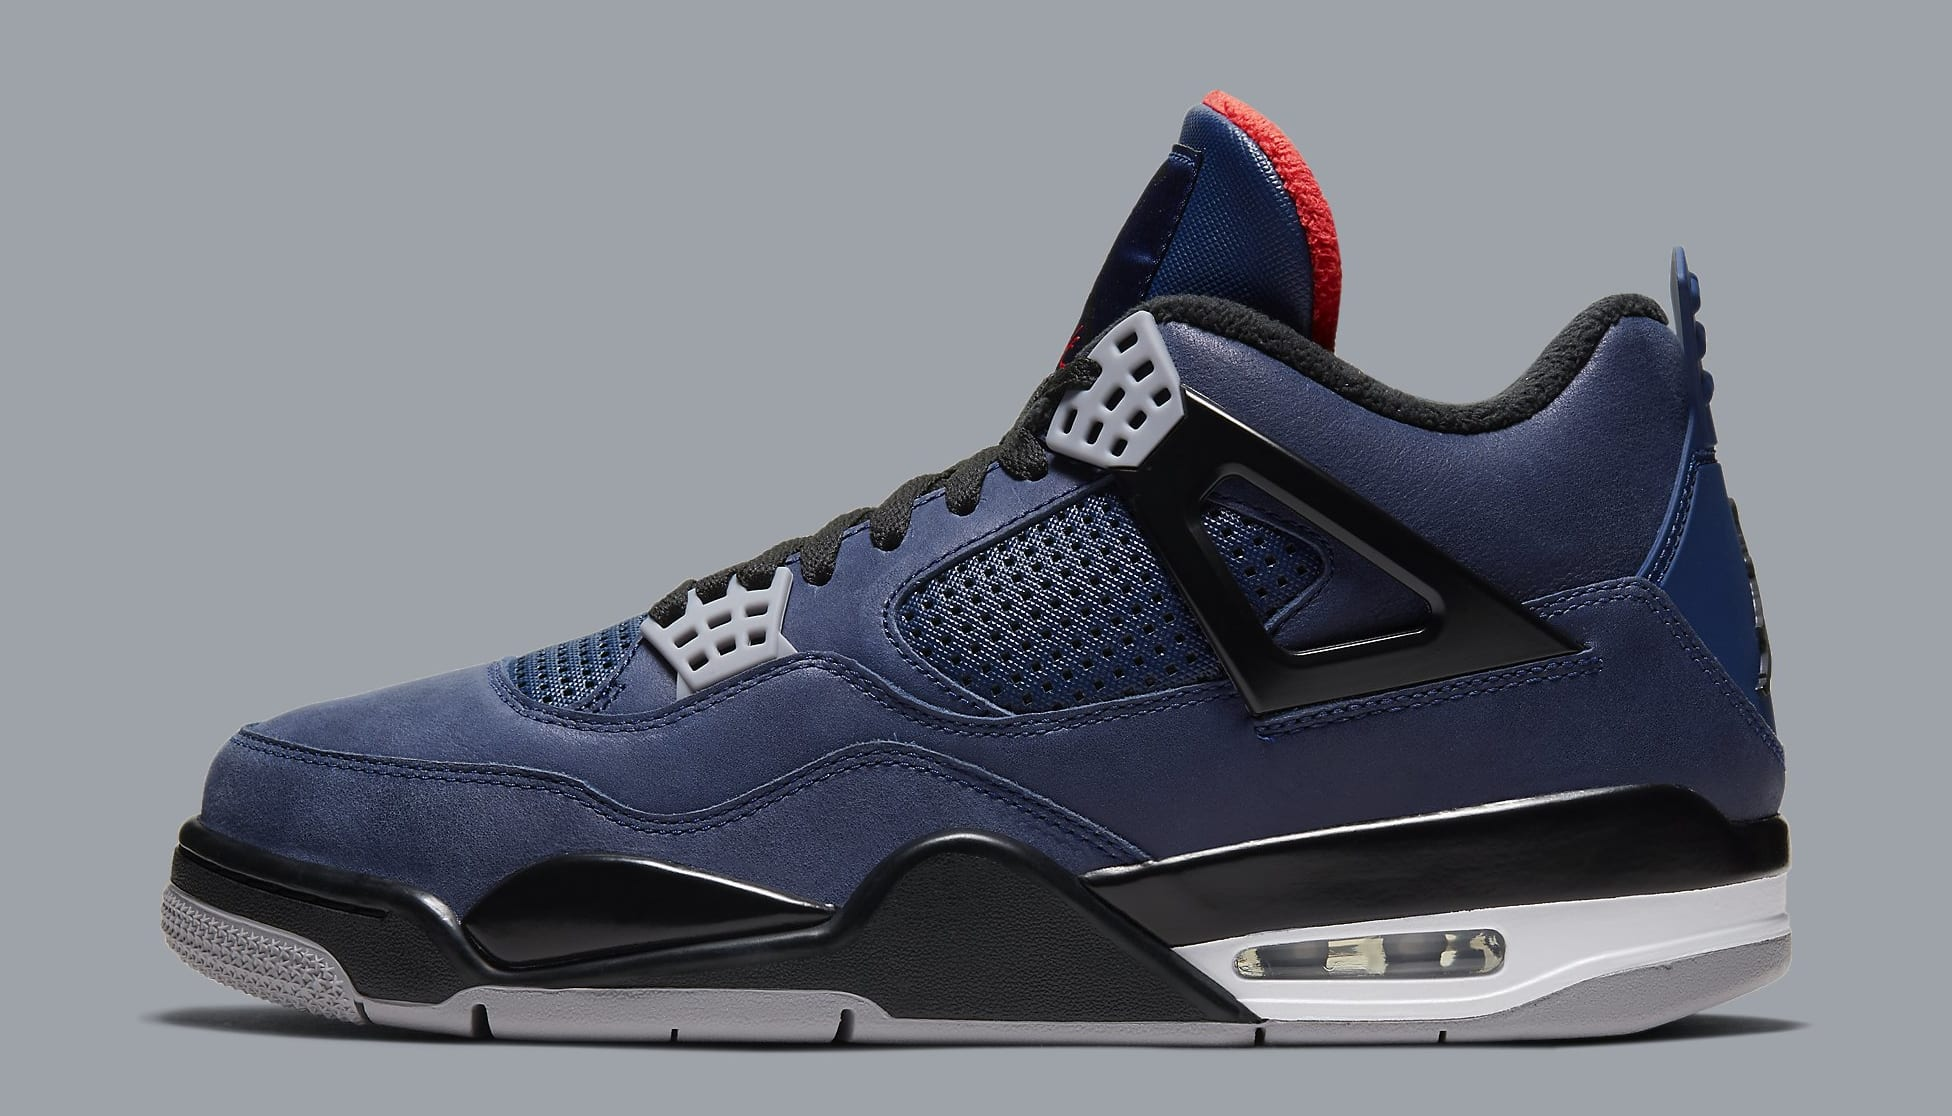 air-jordan-4-iv-retro-wntr-loyal-blue-cq9597-401-lateral